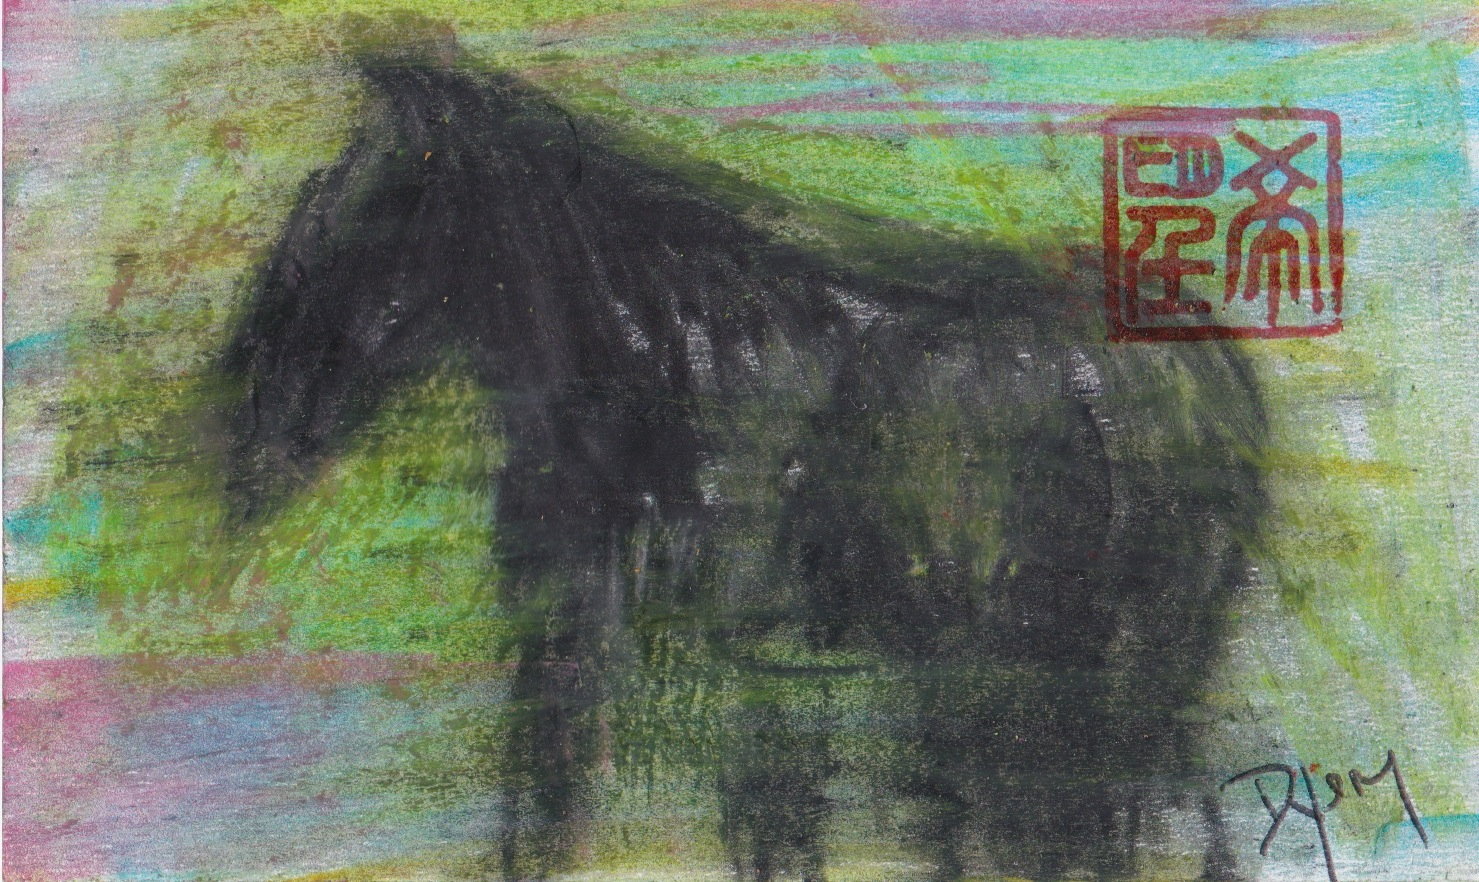 Index card herd